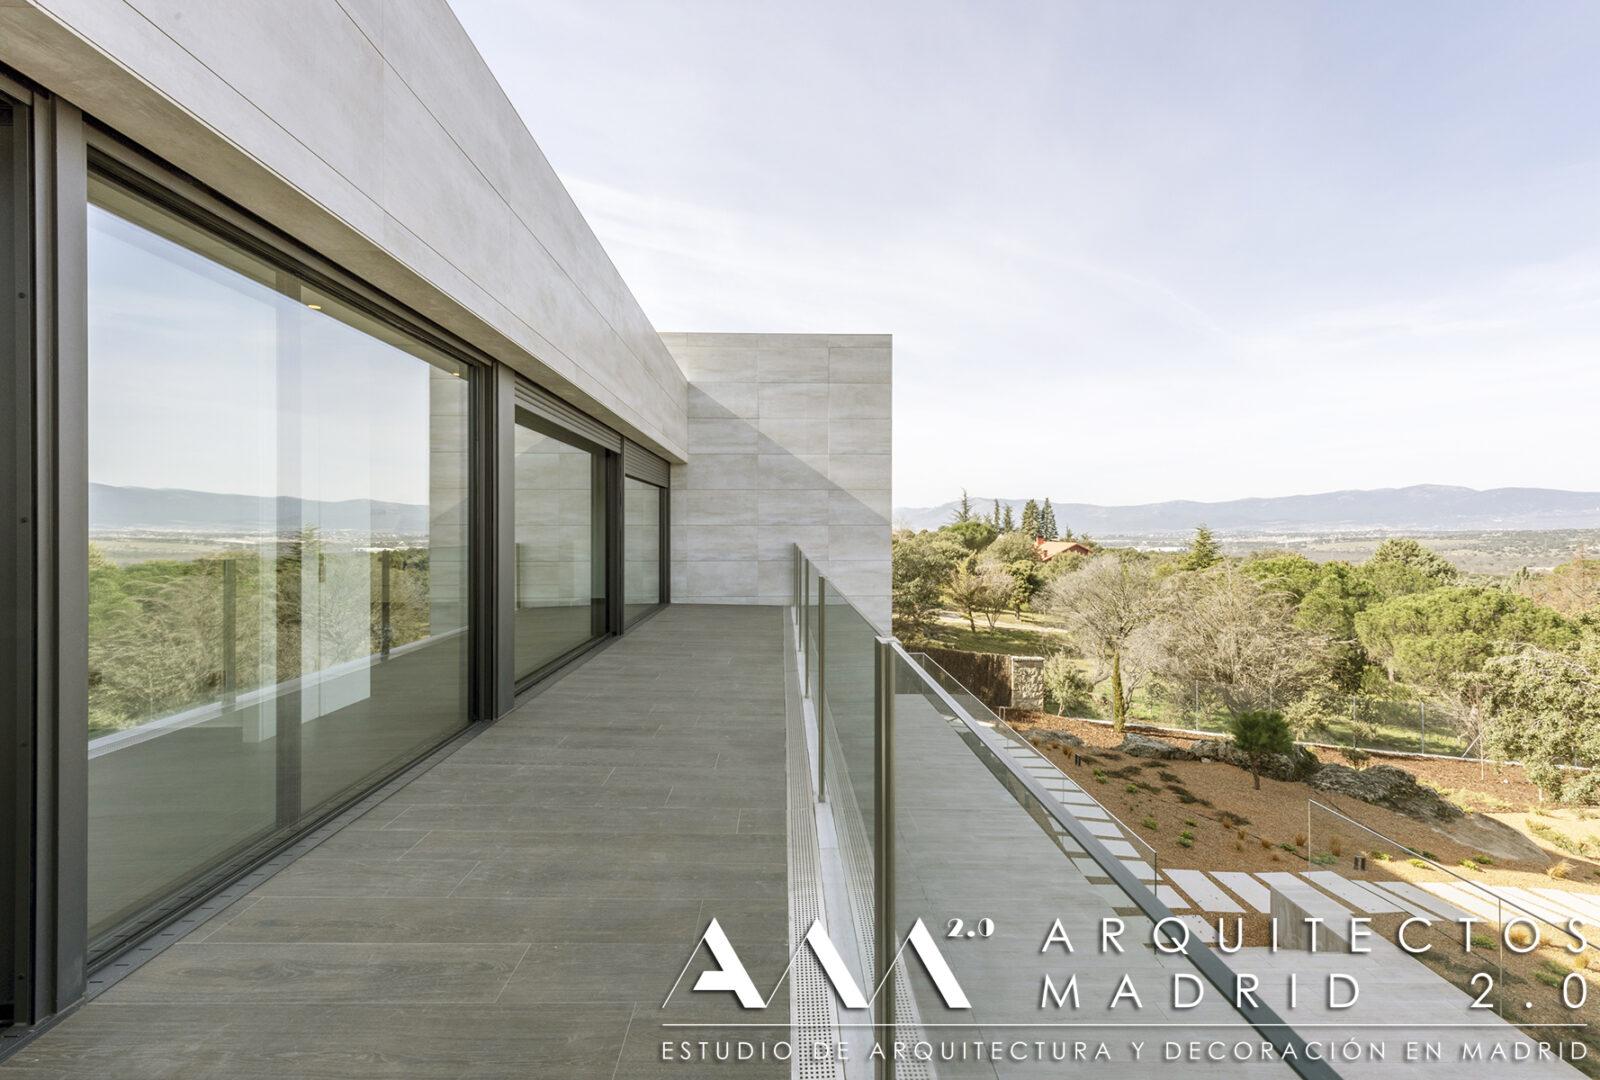 vivienda-unifamiliar-madrid-proyecto-construccion-diseno-arquitectura-interiorismo-03